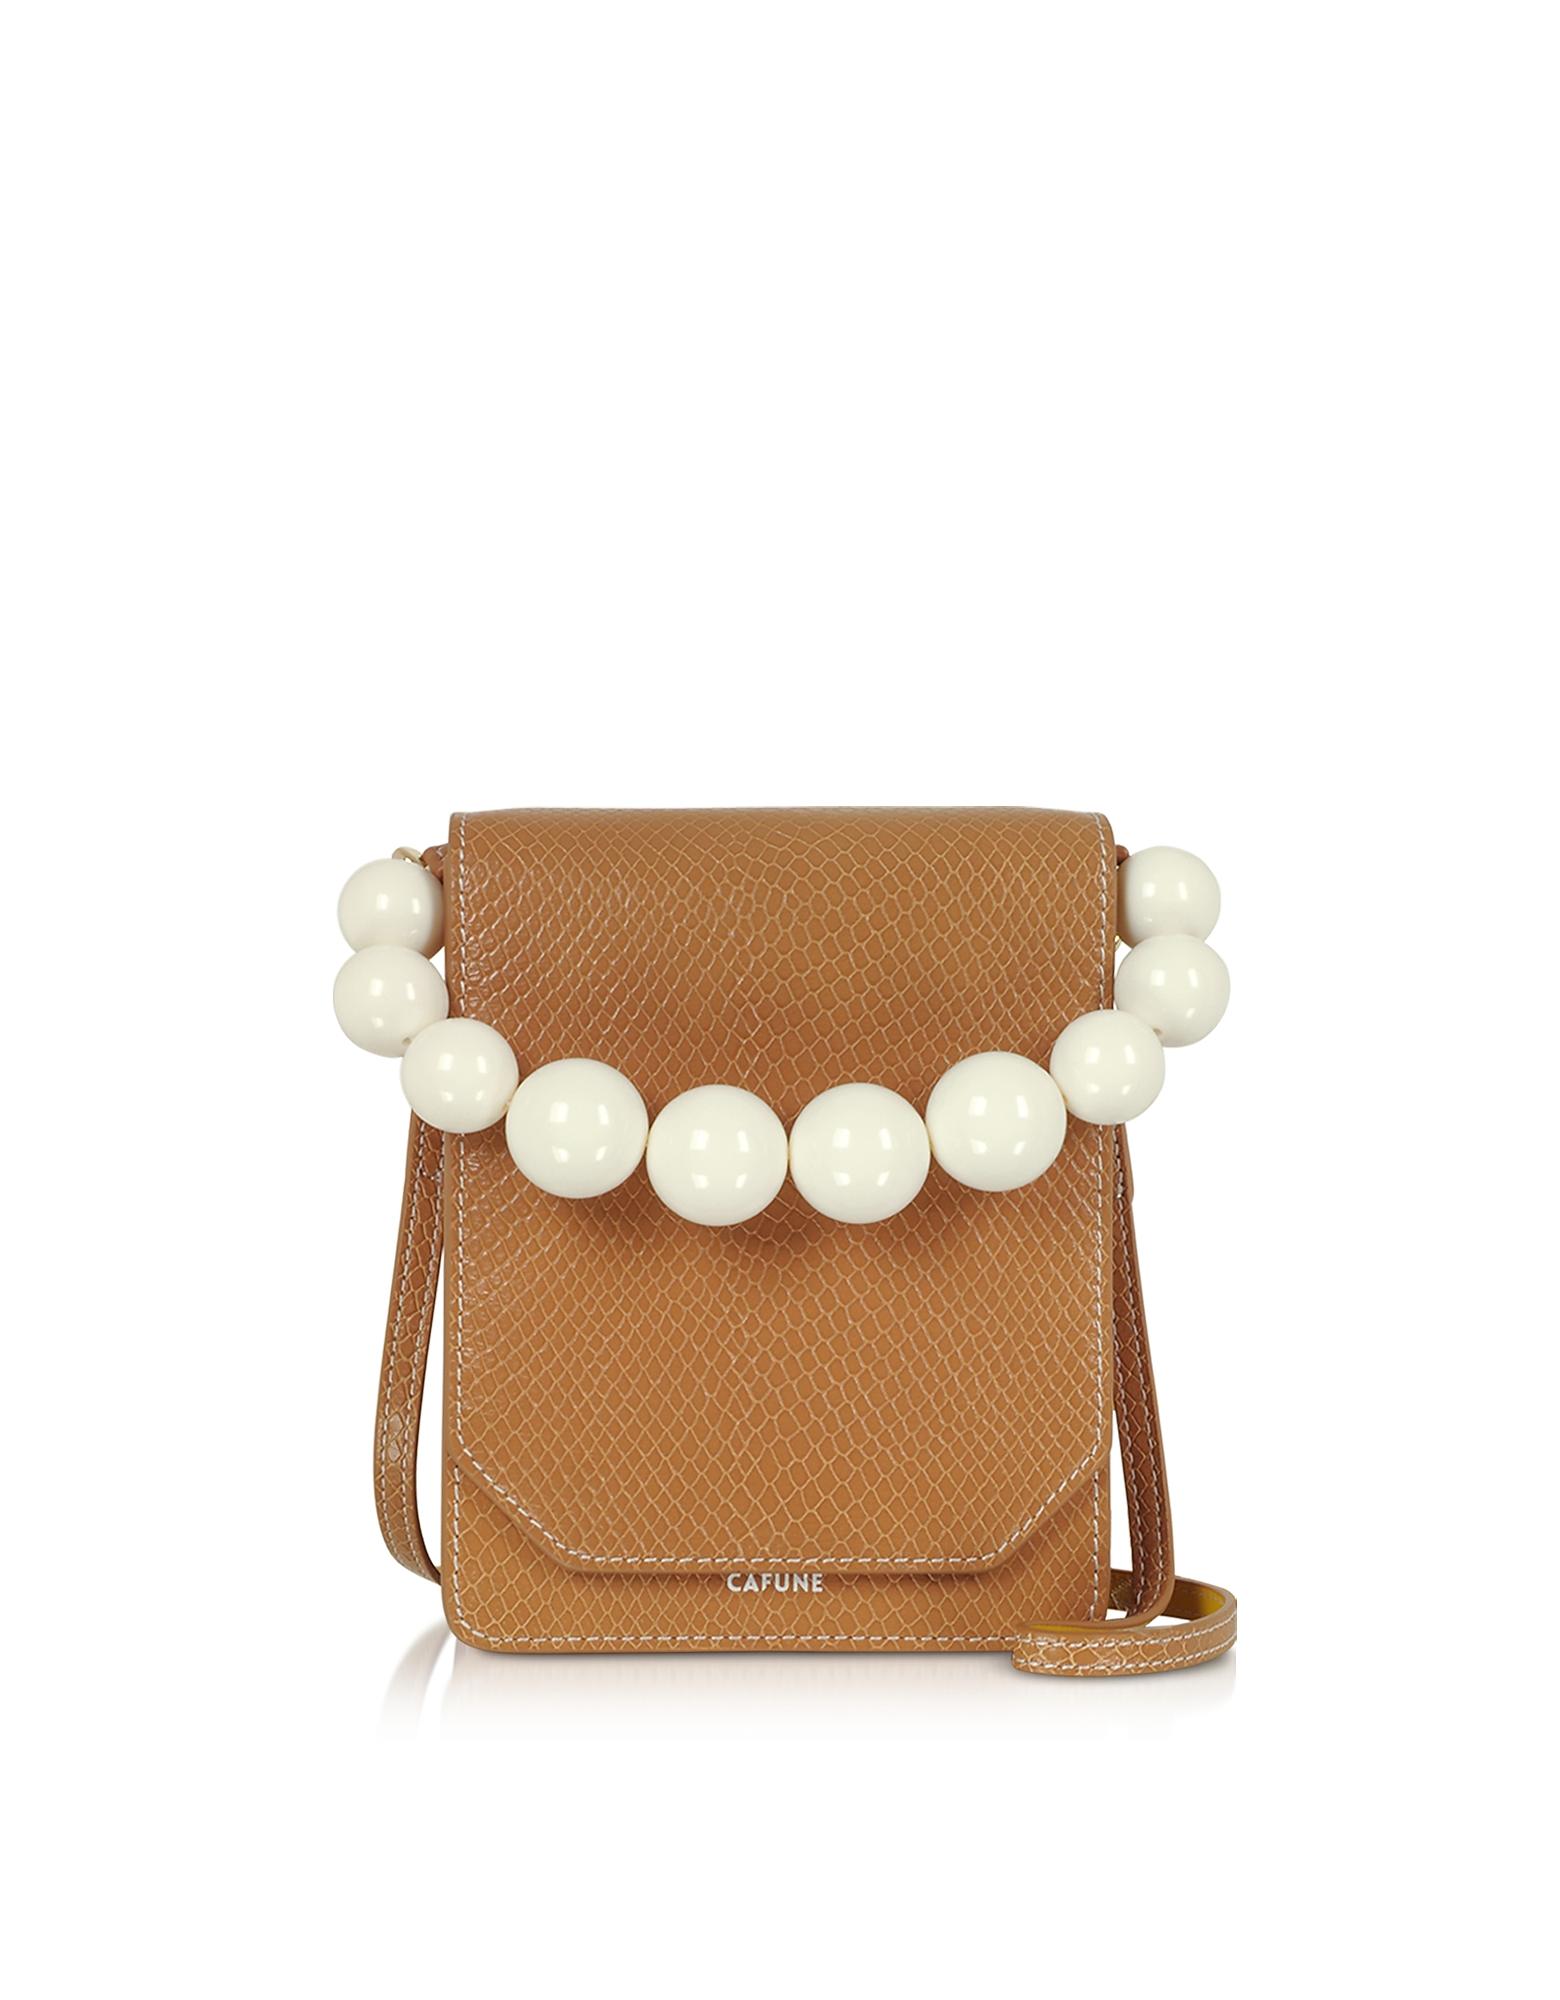 Cafuné Designer Handbags, Caramel Leather Bellows Crossbody Bag